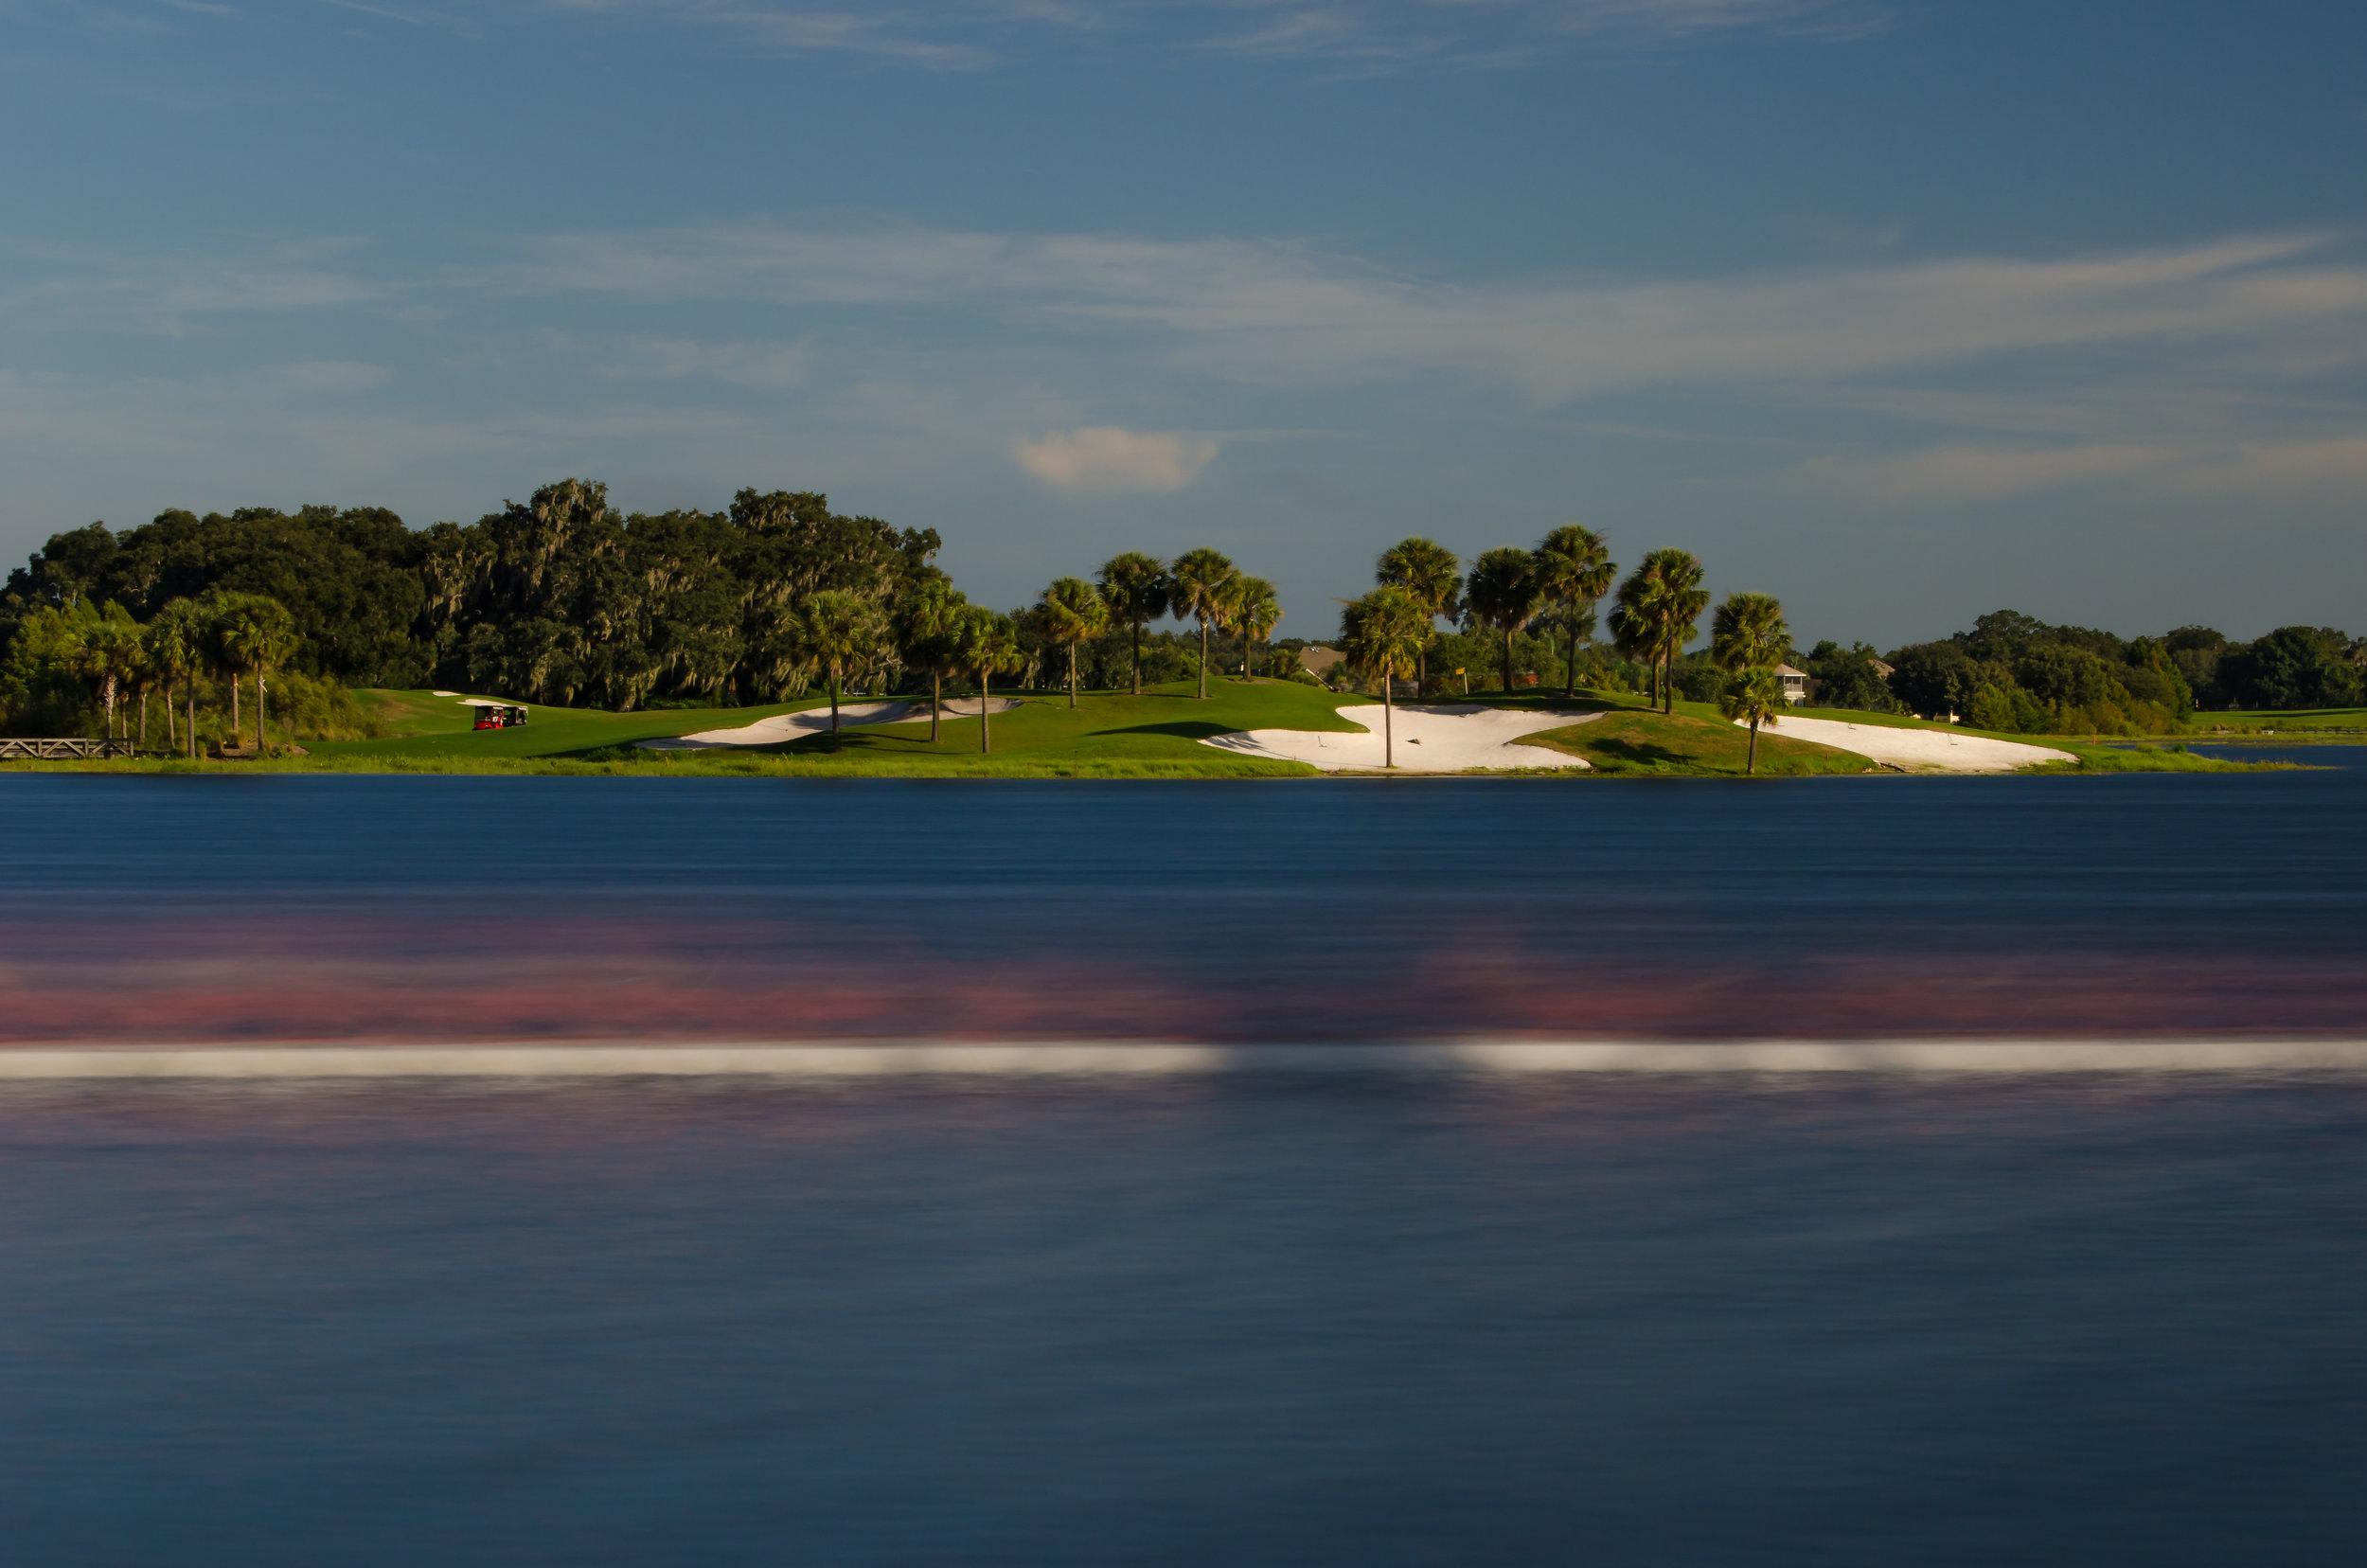 dragon boat-rowing-florida-lake sumter-the villages.jpg